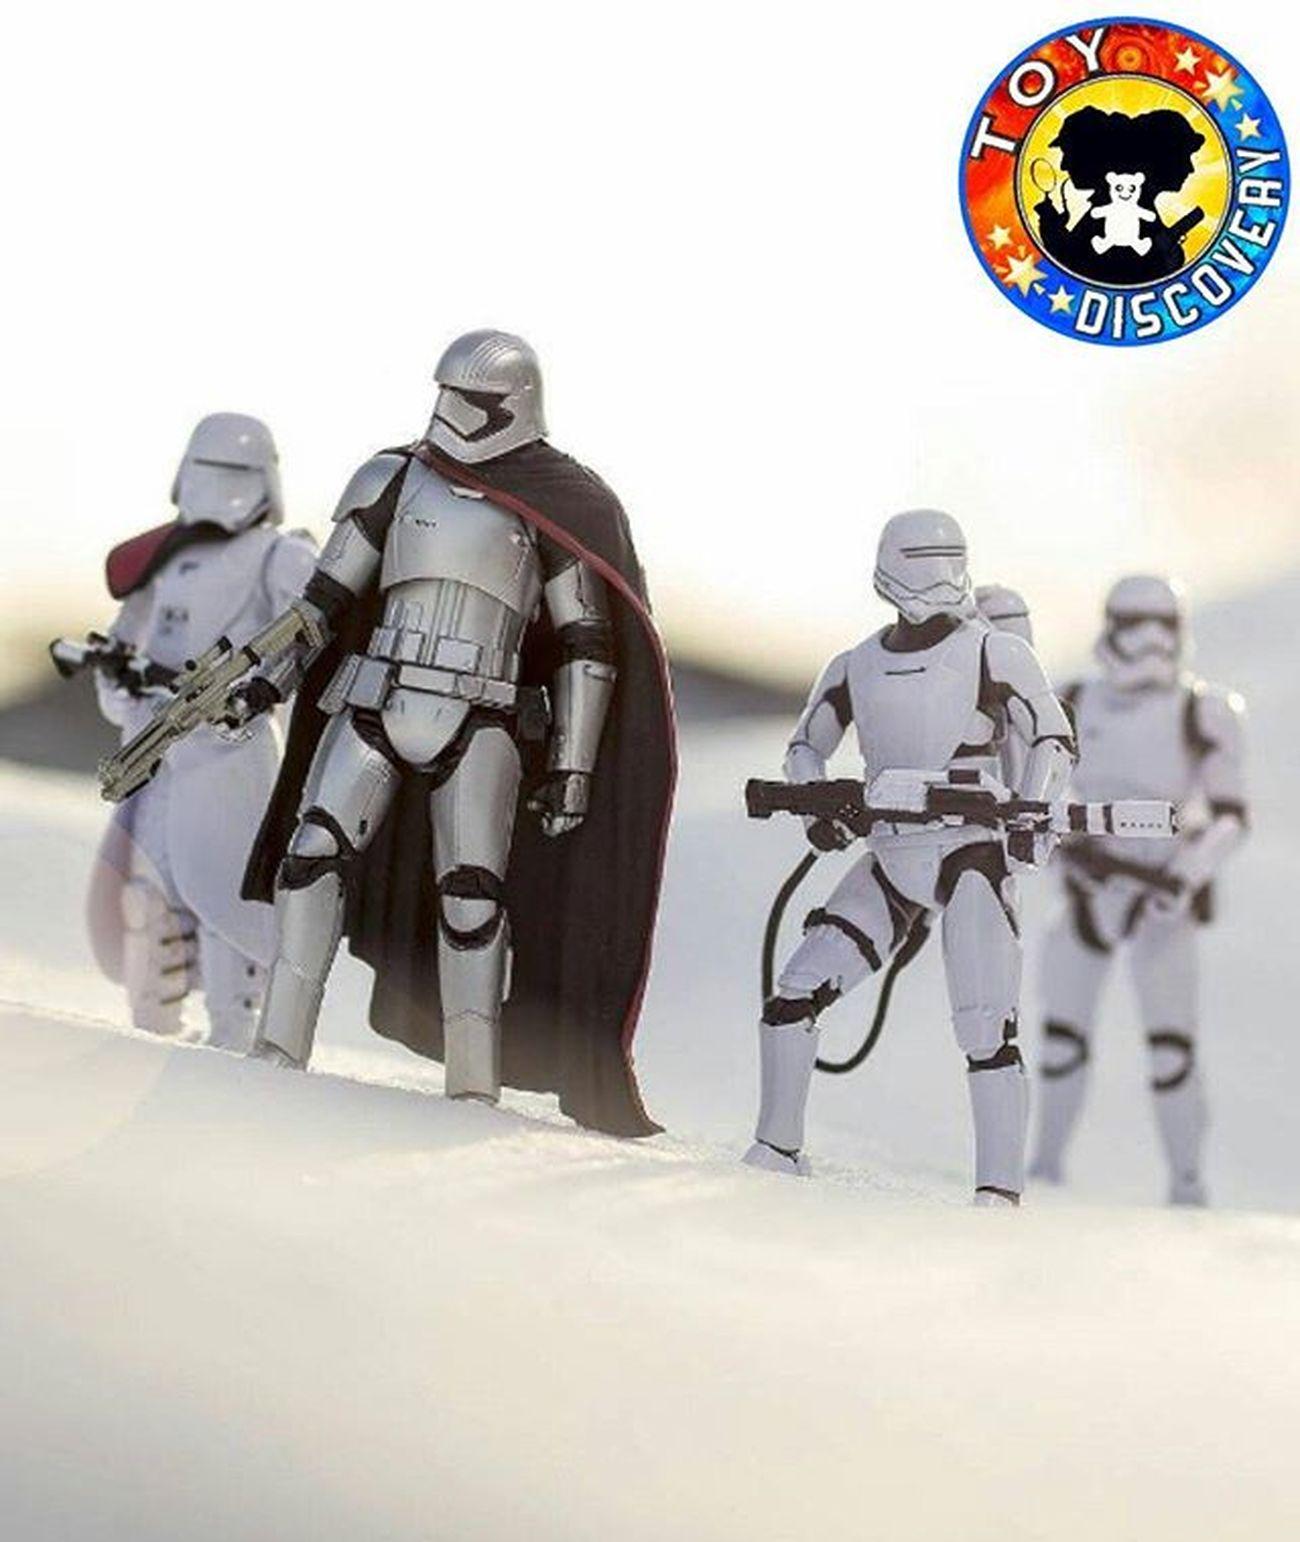 🌠🌠🌠🌠🌠🌠🌠🌠🌠🌠🌠🌠🌠🌠🌠 Toydiscovery feature 🌠🌠🌠🌠🌠🌠🌠🌠🌠🌠🌠🌠🌠🌠🌠 Congrats to: @gurtastix 🌠🌠🌠🌠🌠🌠🌠🌠🌠🌠🌠🌠🌠🌠🌠 If you want us feature your art Toy pic pls Follow n tag: @TOYDISCOVERY . Toydiscovery . 🌠🌠🌠🌠🌠🌠🌠🌠🌠🌠🌠🌠🌠🌠🌠 Thank You By @Toydiscovery 10.02.2016 . Toyphotography Toys Toygroup_alliance Anime Toyslagram LEGO Afol Bricknetwork Nendoroid Love Tgif_toys Chewbacca Hansolo Dccomics Bb8 Otaku Antman Toystagram Legostagram Toyslagram_lego Avengers Starwars toysphotogram nintendo Kawaii walle